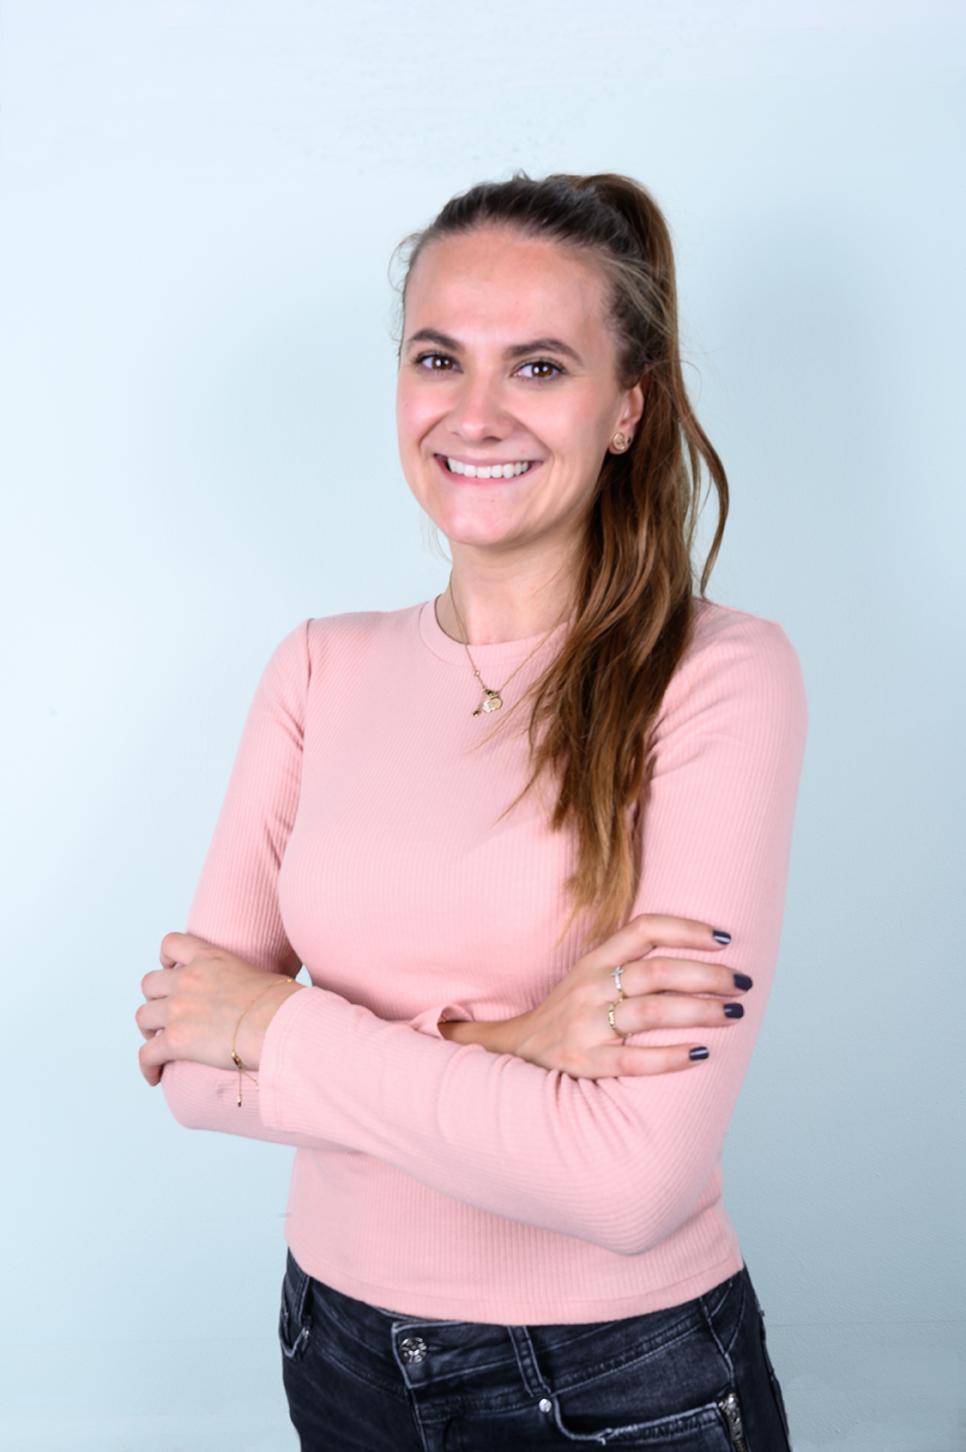 NicoleGregorczyk